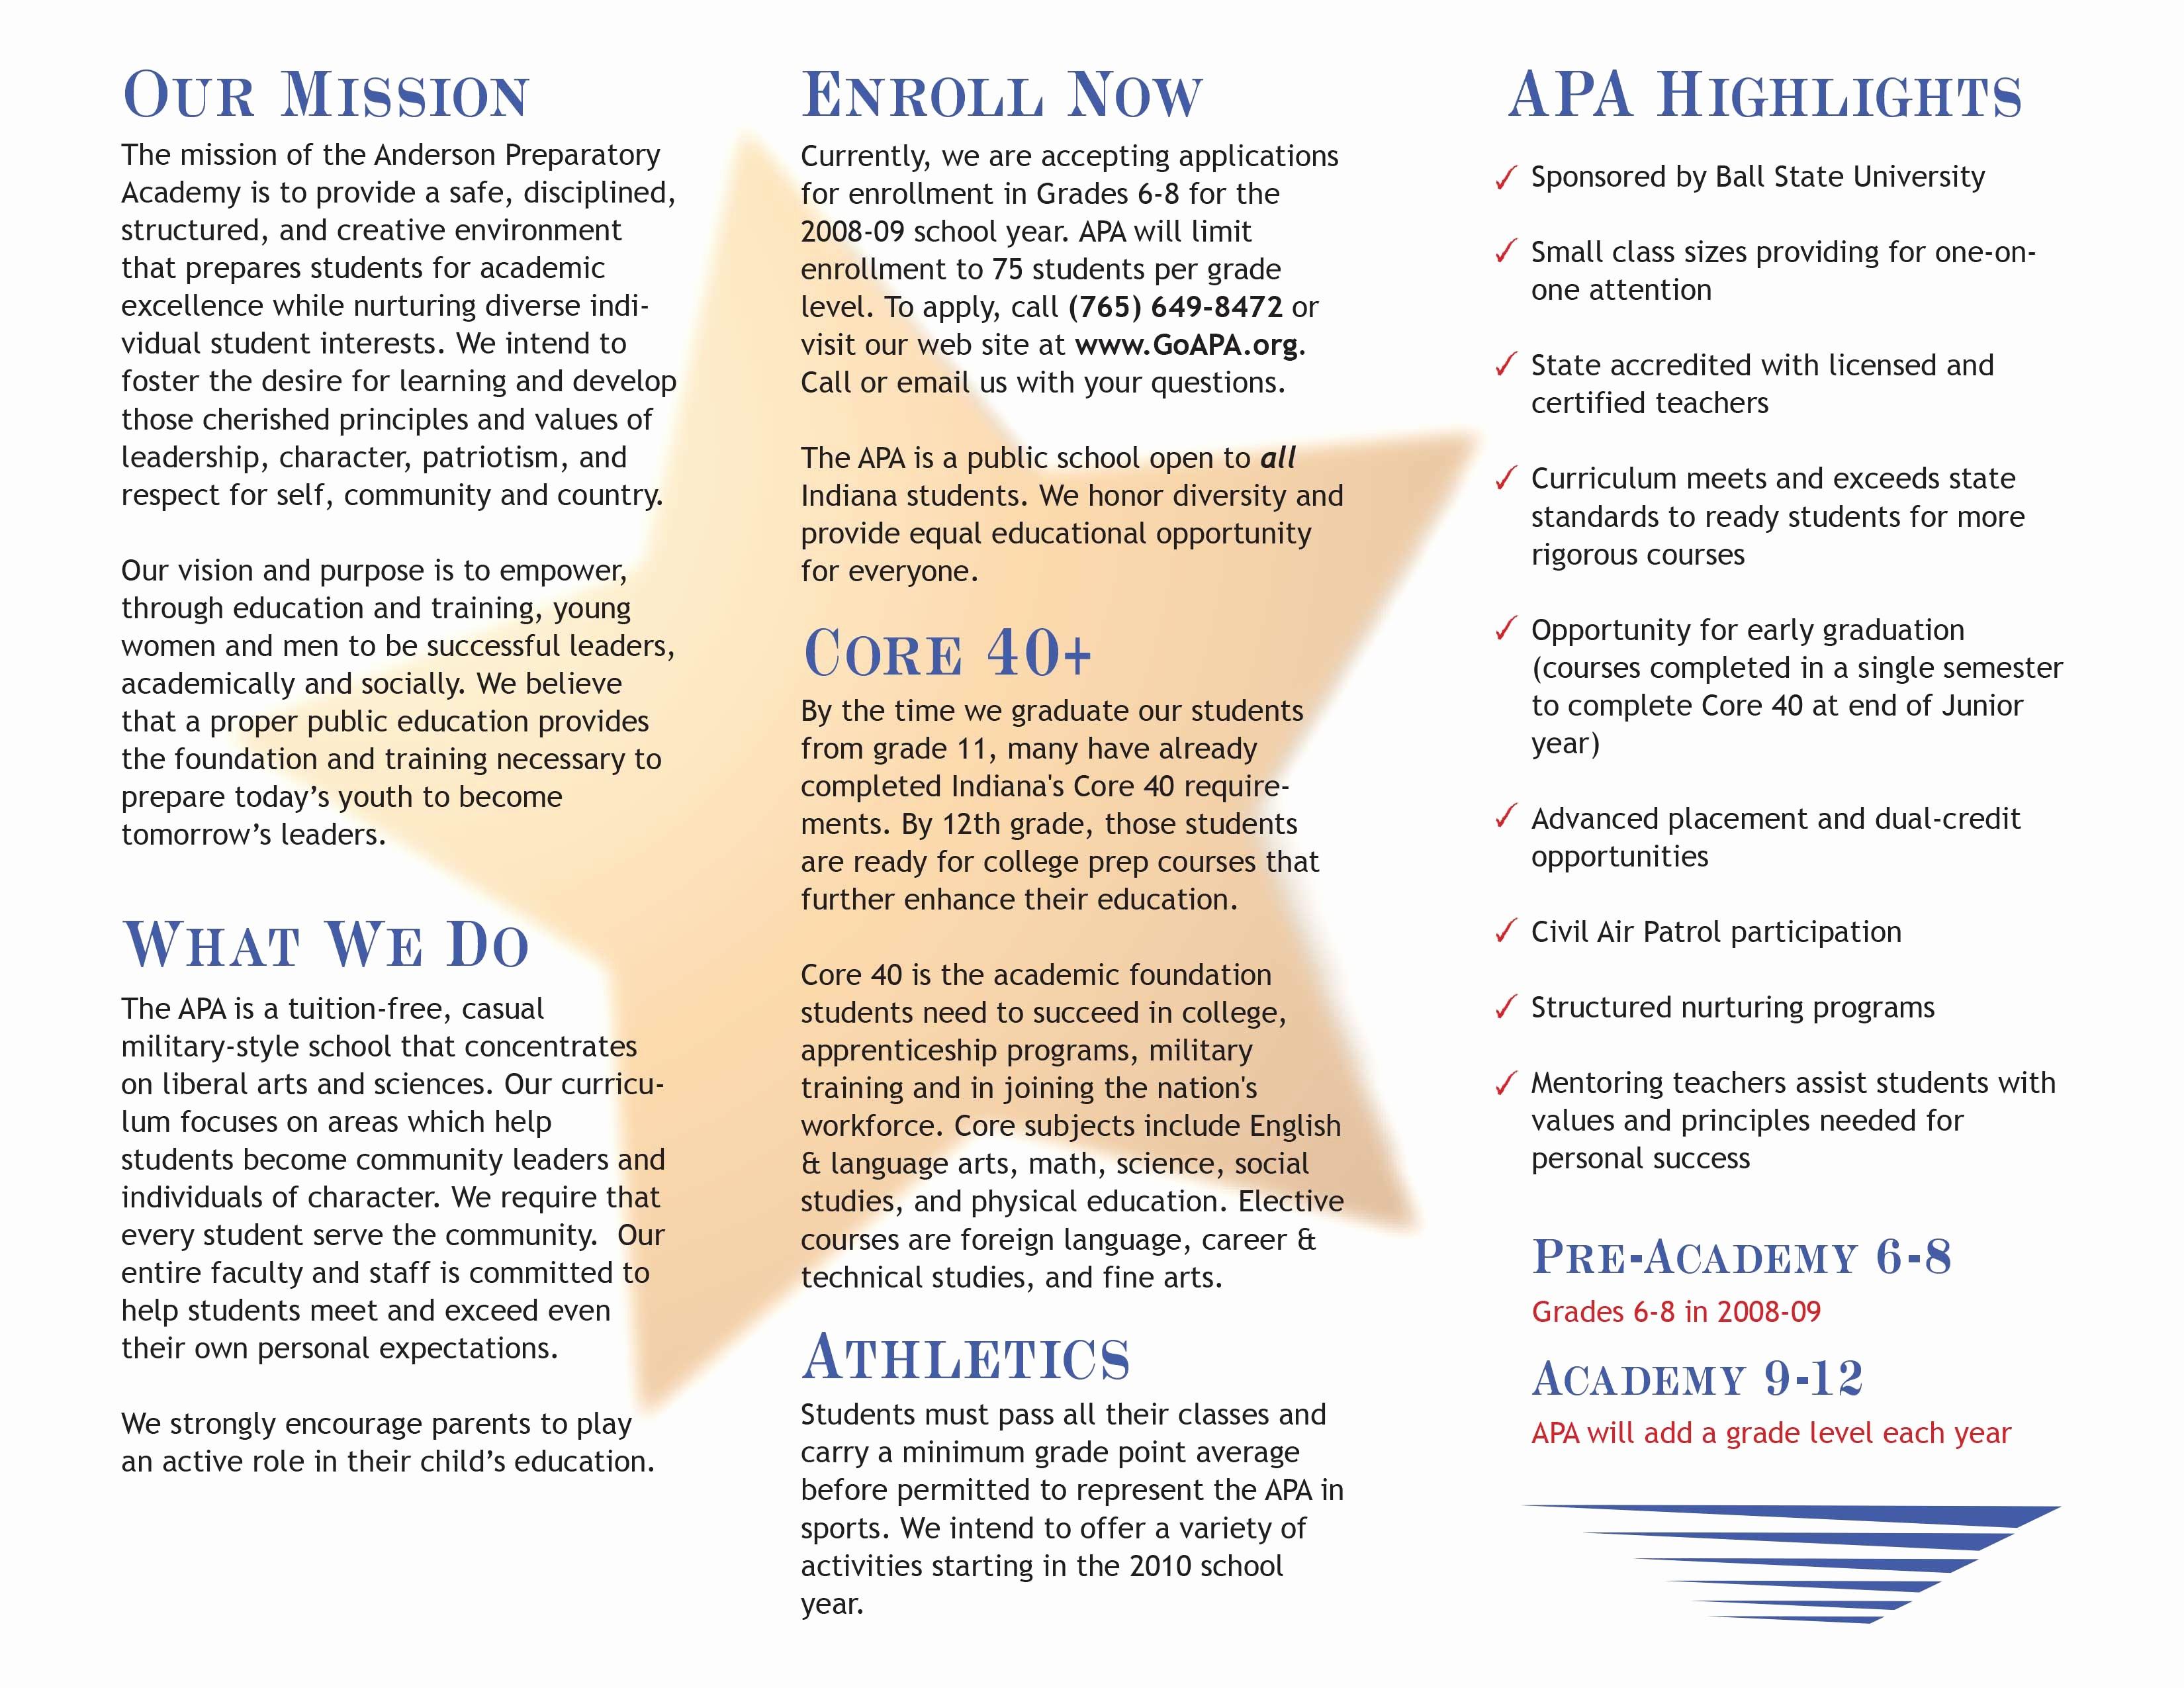 How to format A Brochure Fresh anderson Preparatory Academy – toddbaldridge